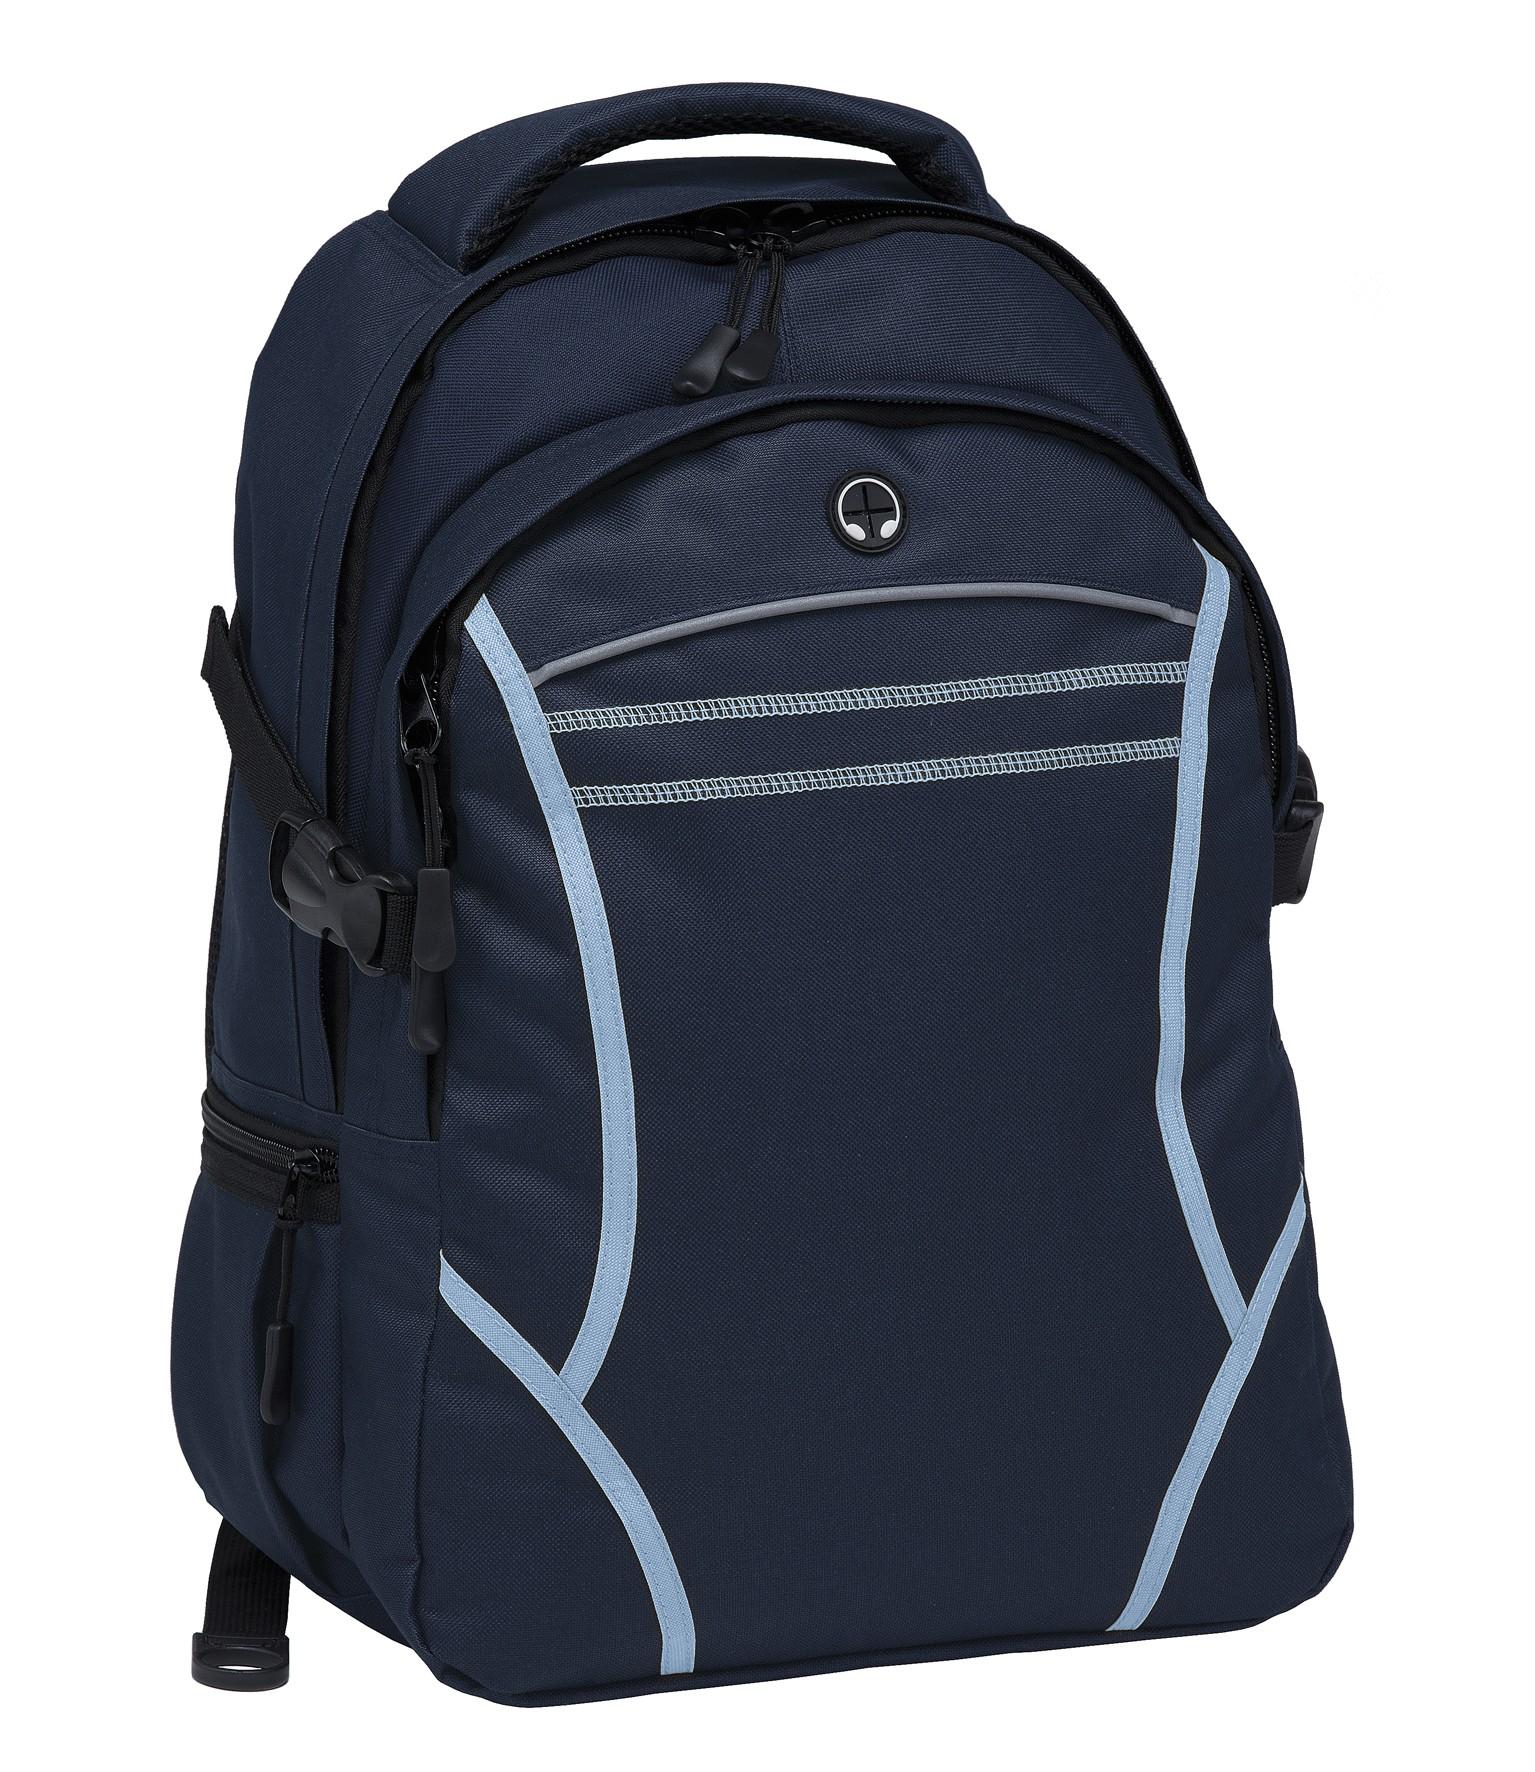 Reflex Backpack - Navy & Sky